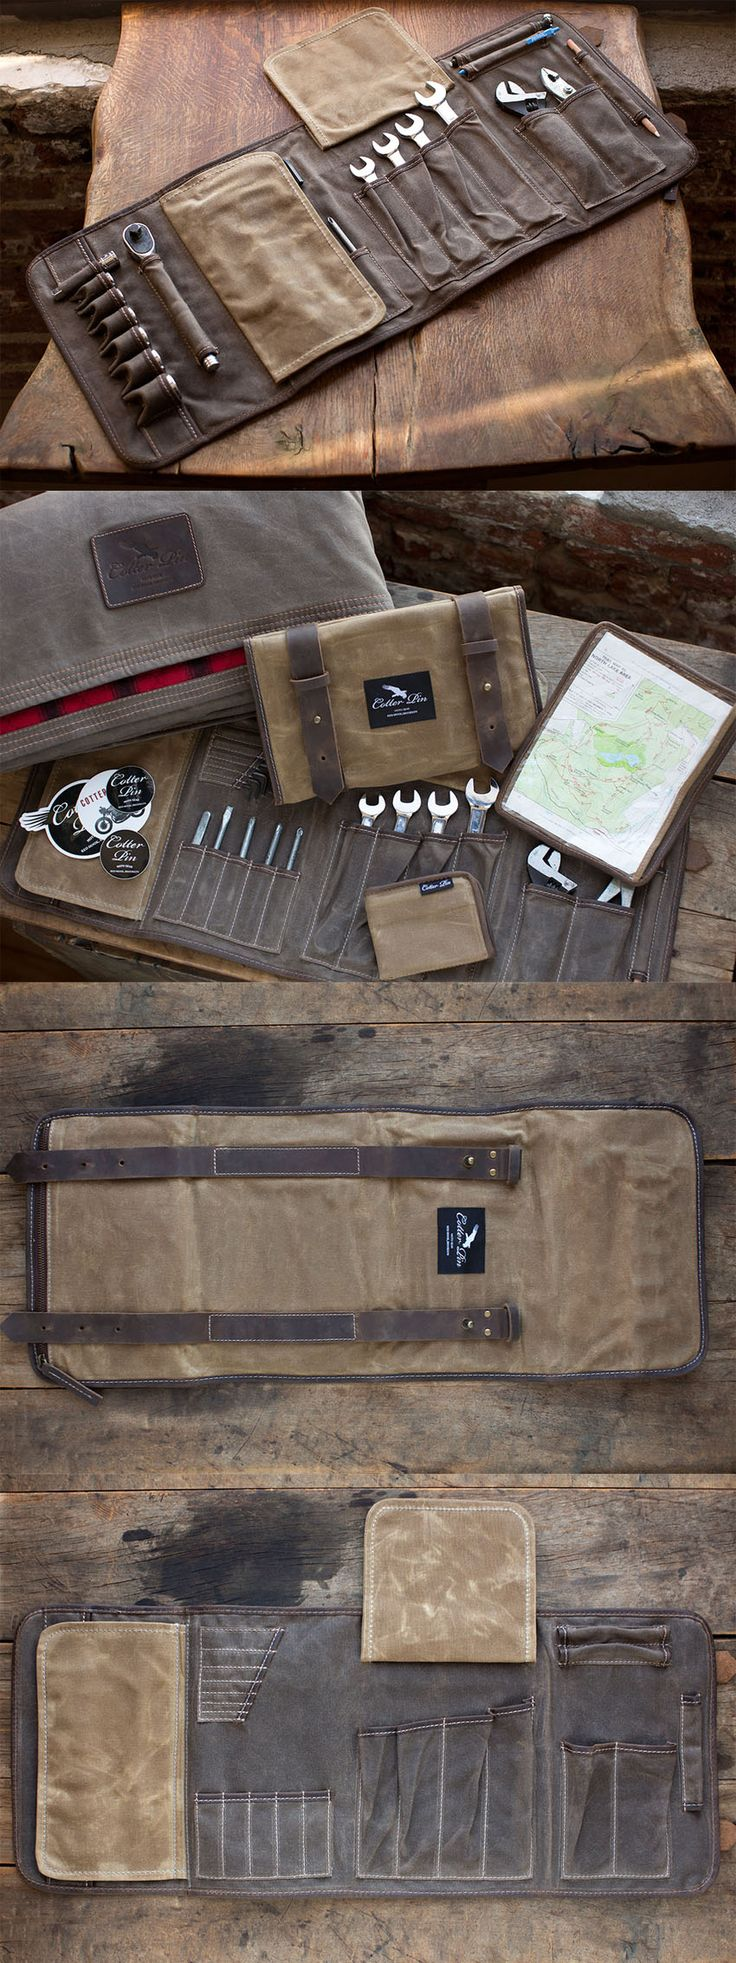 THE ORIGINAL TOOL BOOK - Cotter Pin http://shop.ironandair.com/the-original-tool-book-cotter-pin/